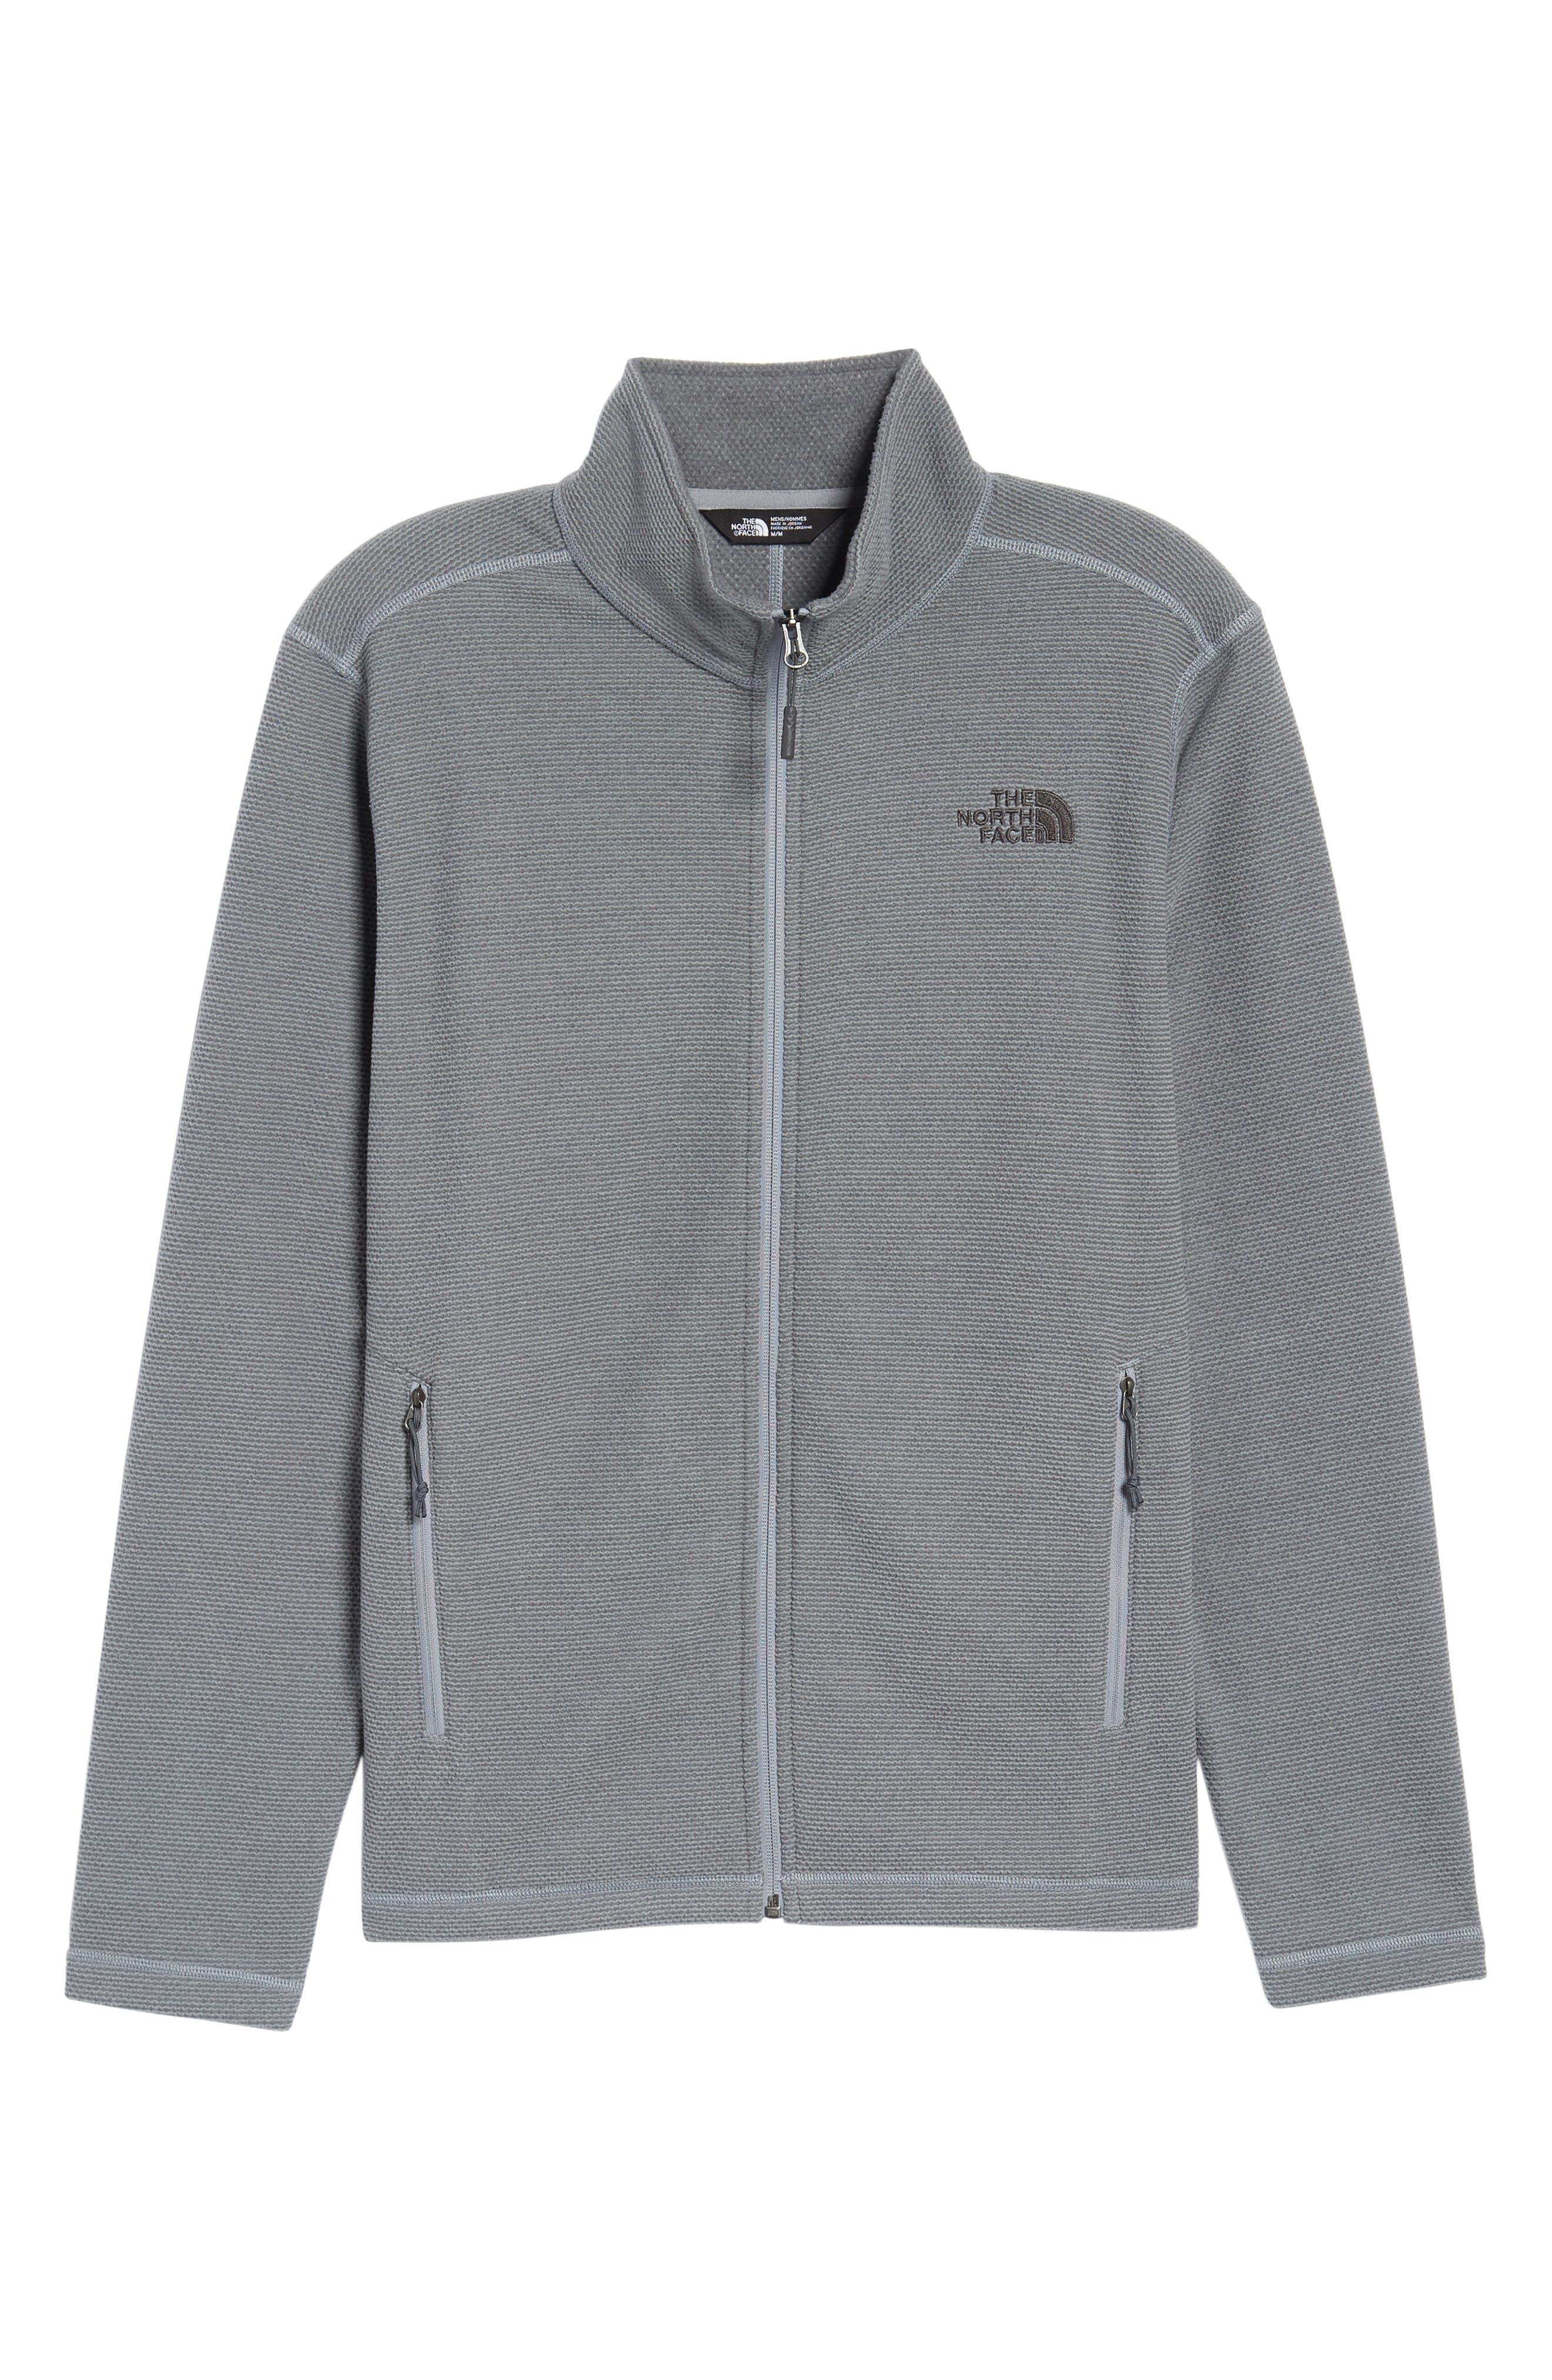 Alternate Image 1 Selected - The North Face Cap Rock Fleece Jacket